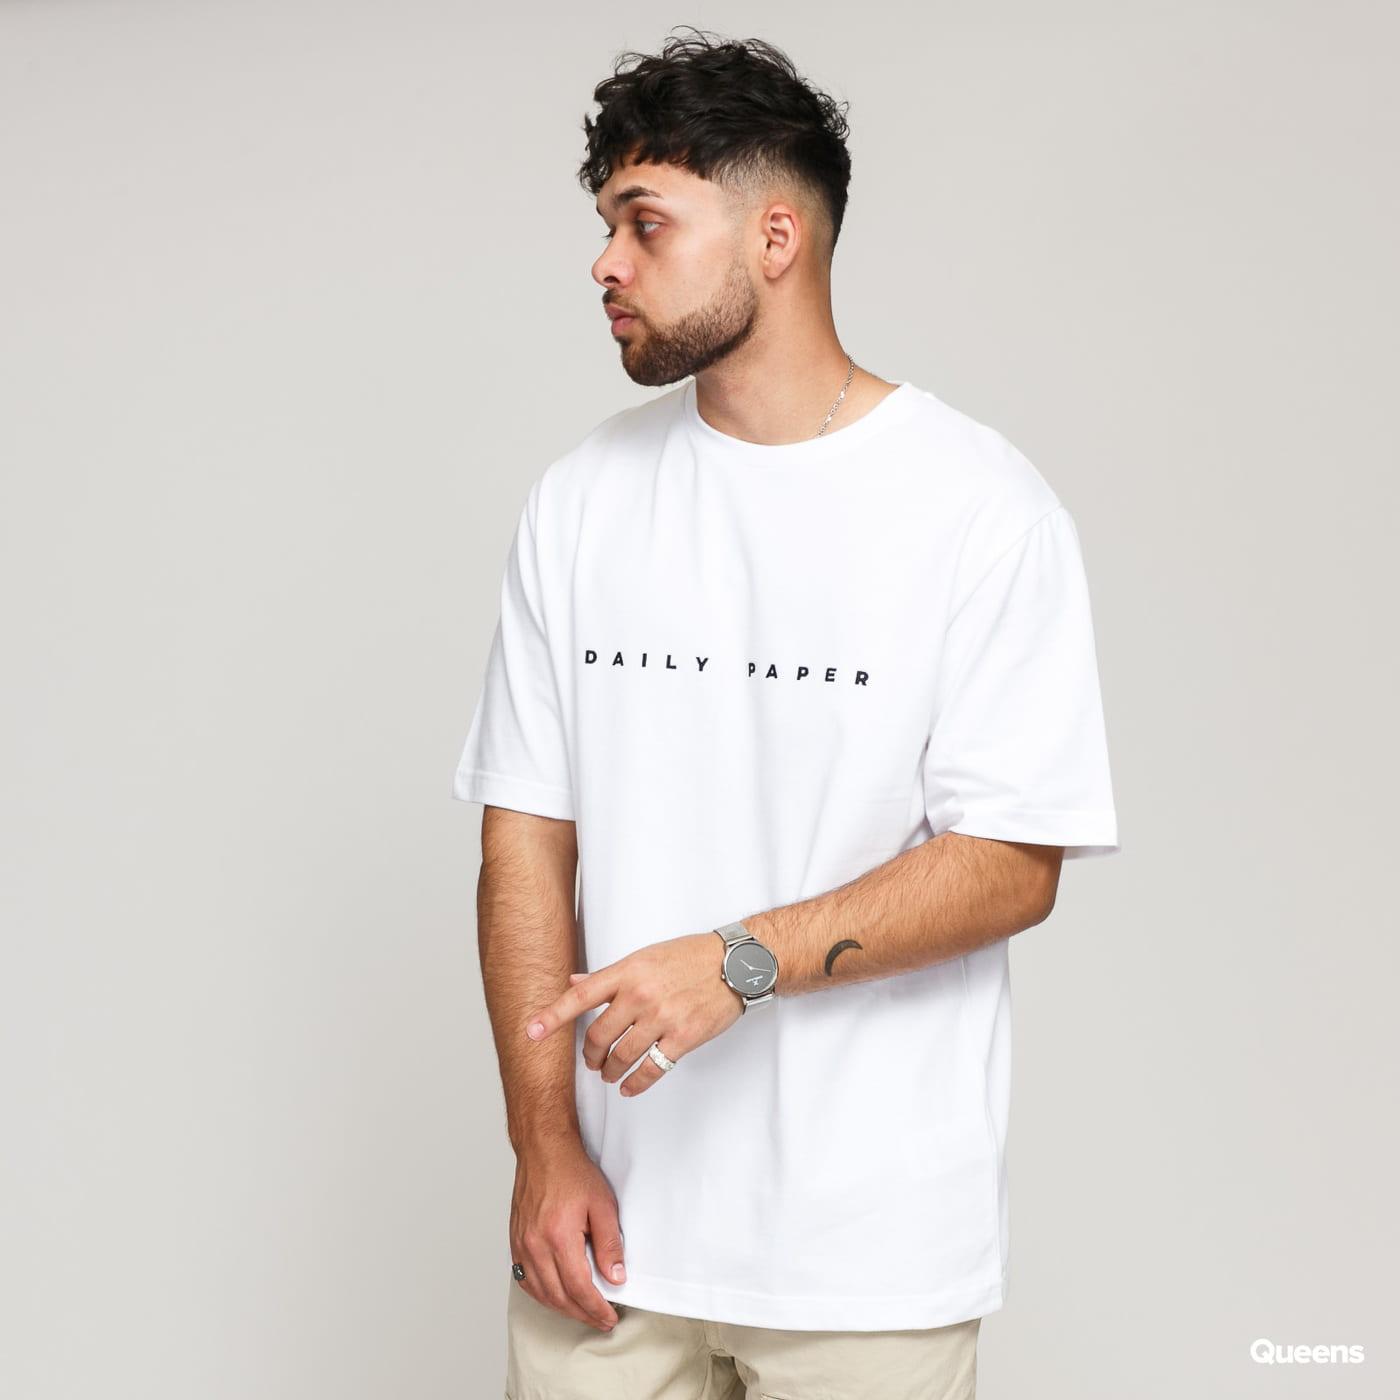 Daily Paper White Alias T-Shirt